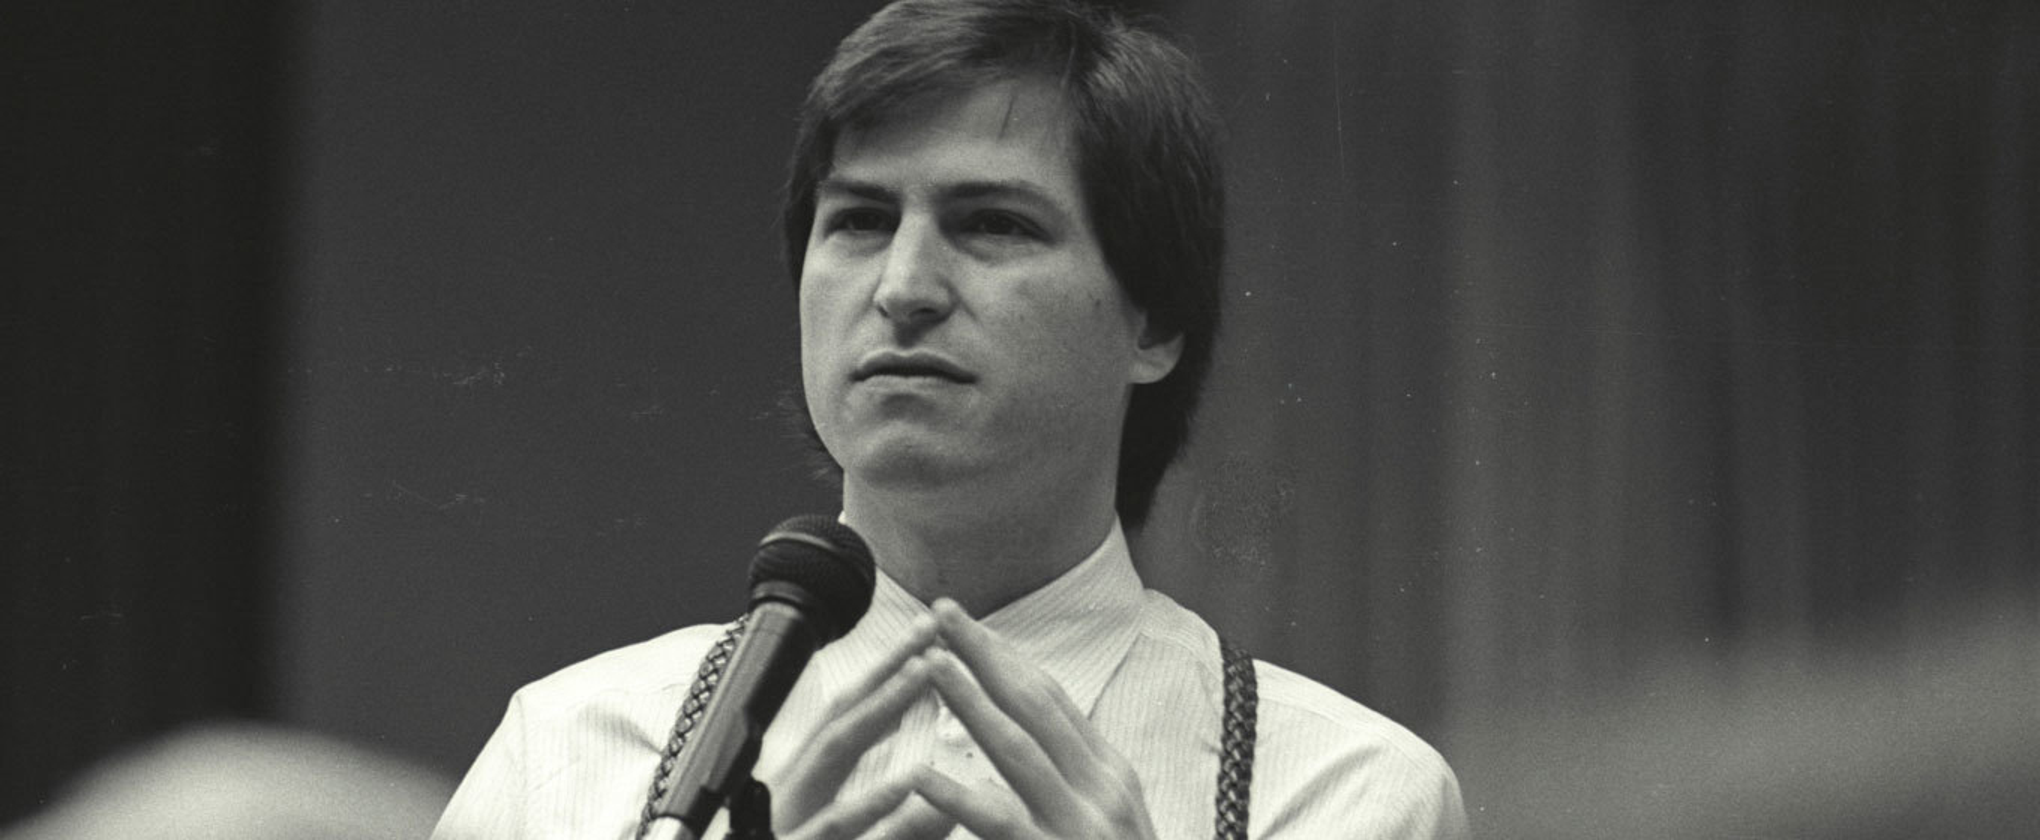 The Career of Steve Jobs